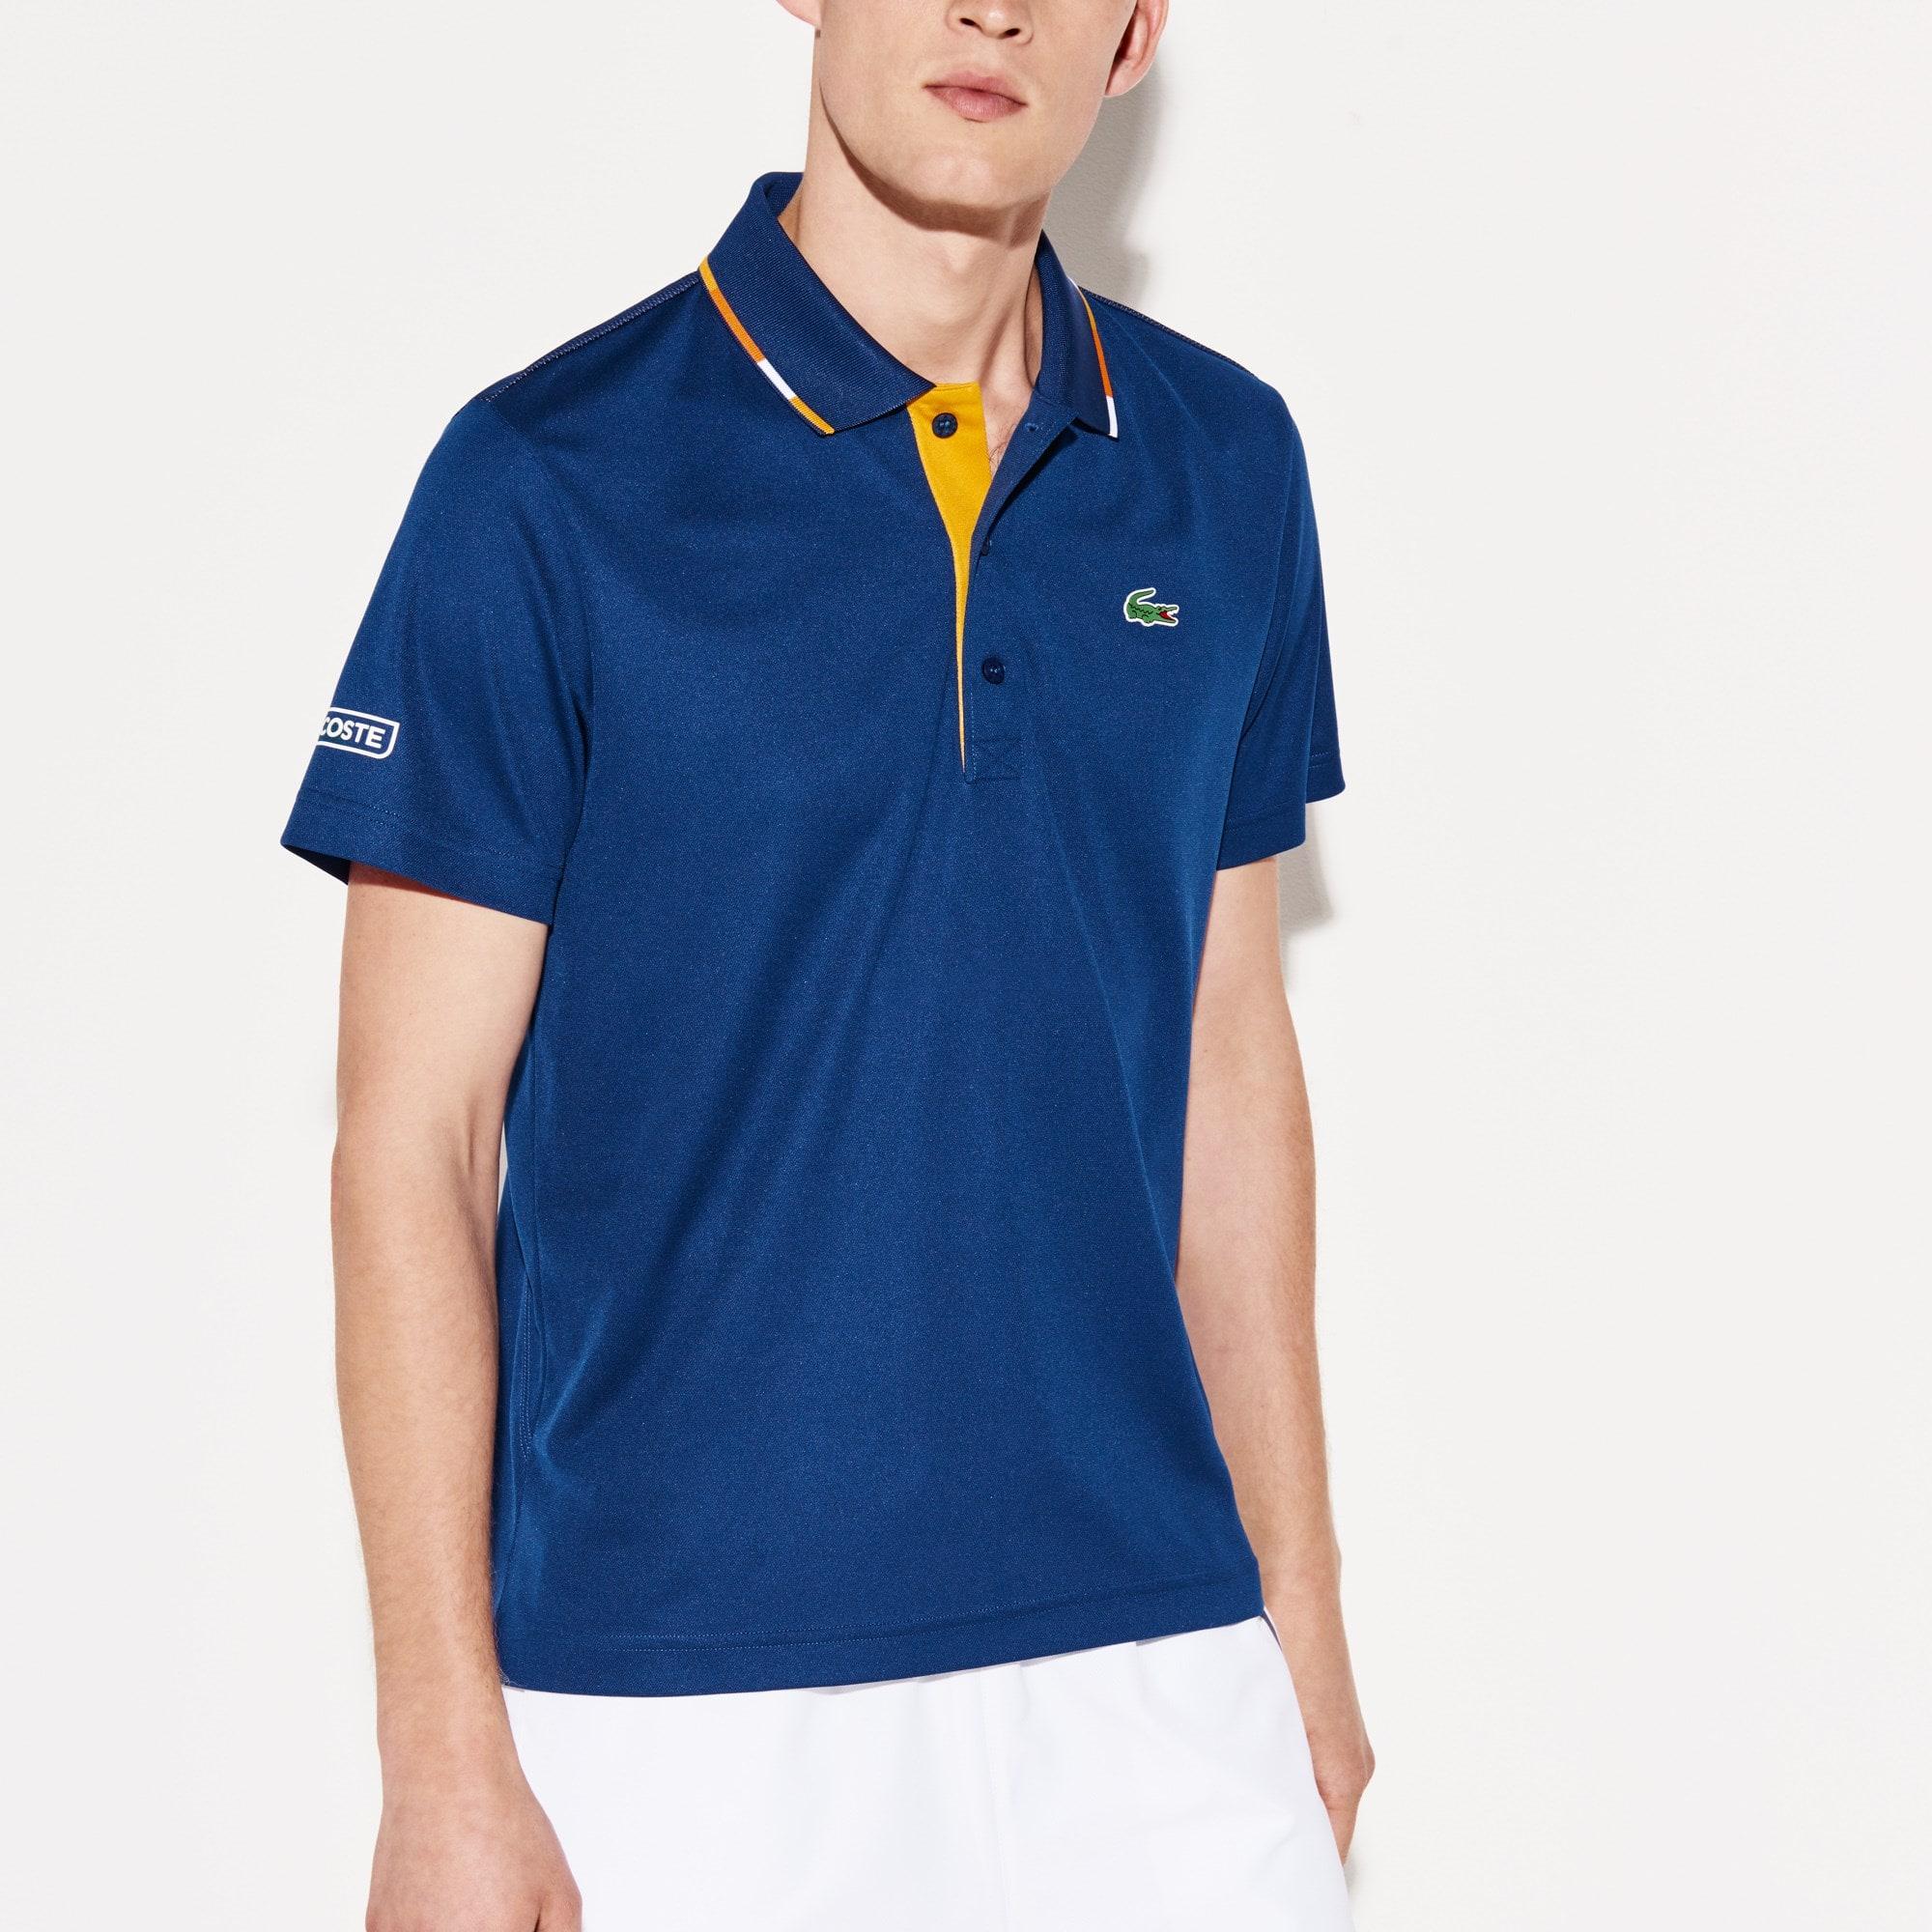 Herren-Poloshirt aus Funktionspiqué LACOSTE SPORT TENNIS